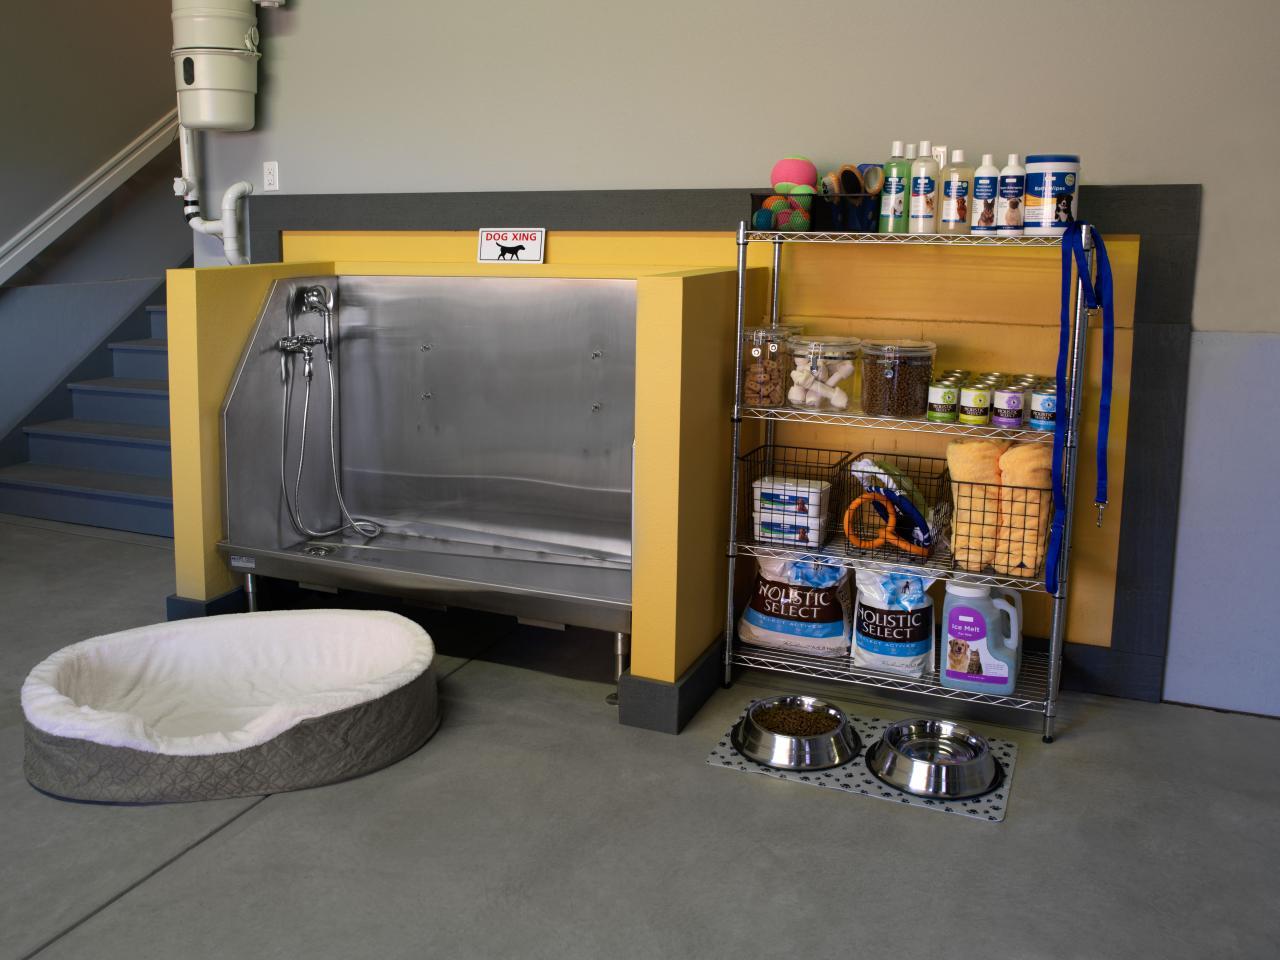 Hgtv green home 2011 garage interior pictures hgtv for Diy dog bathing system